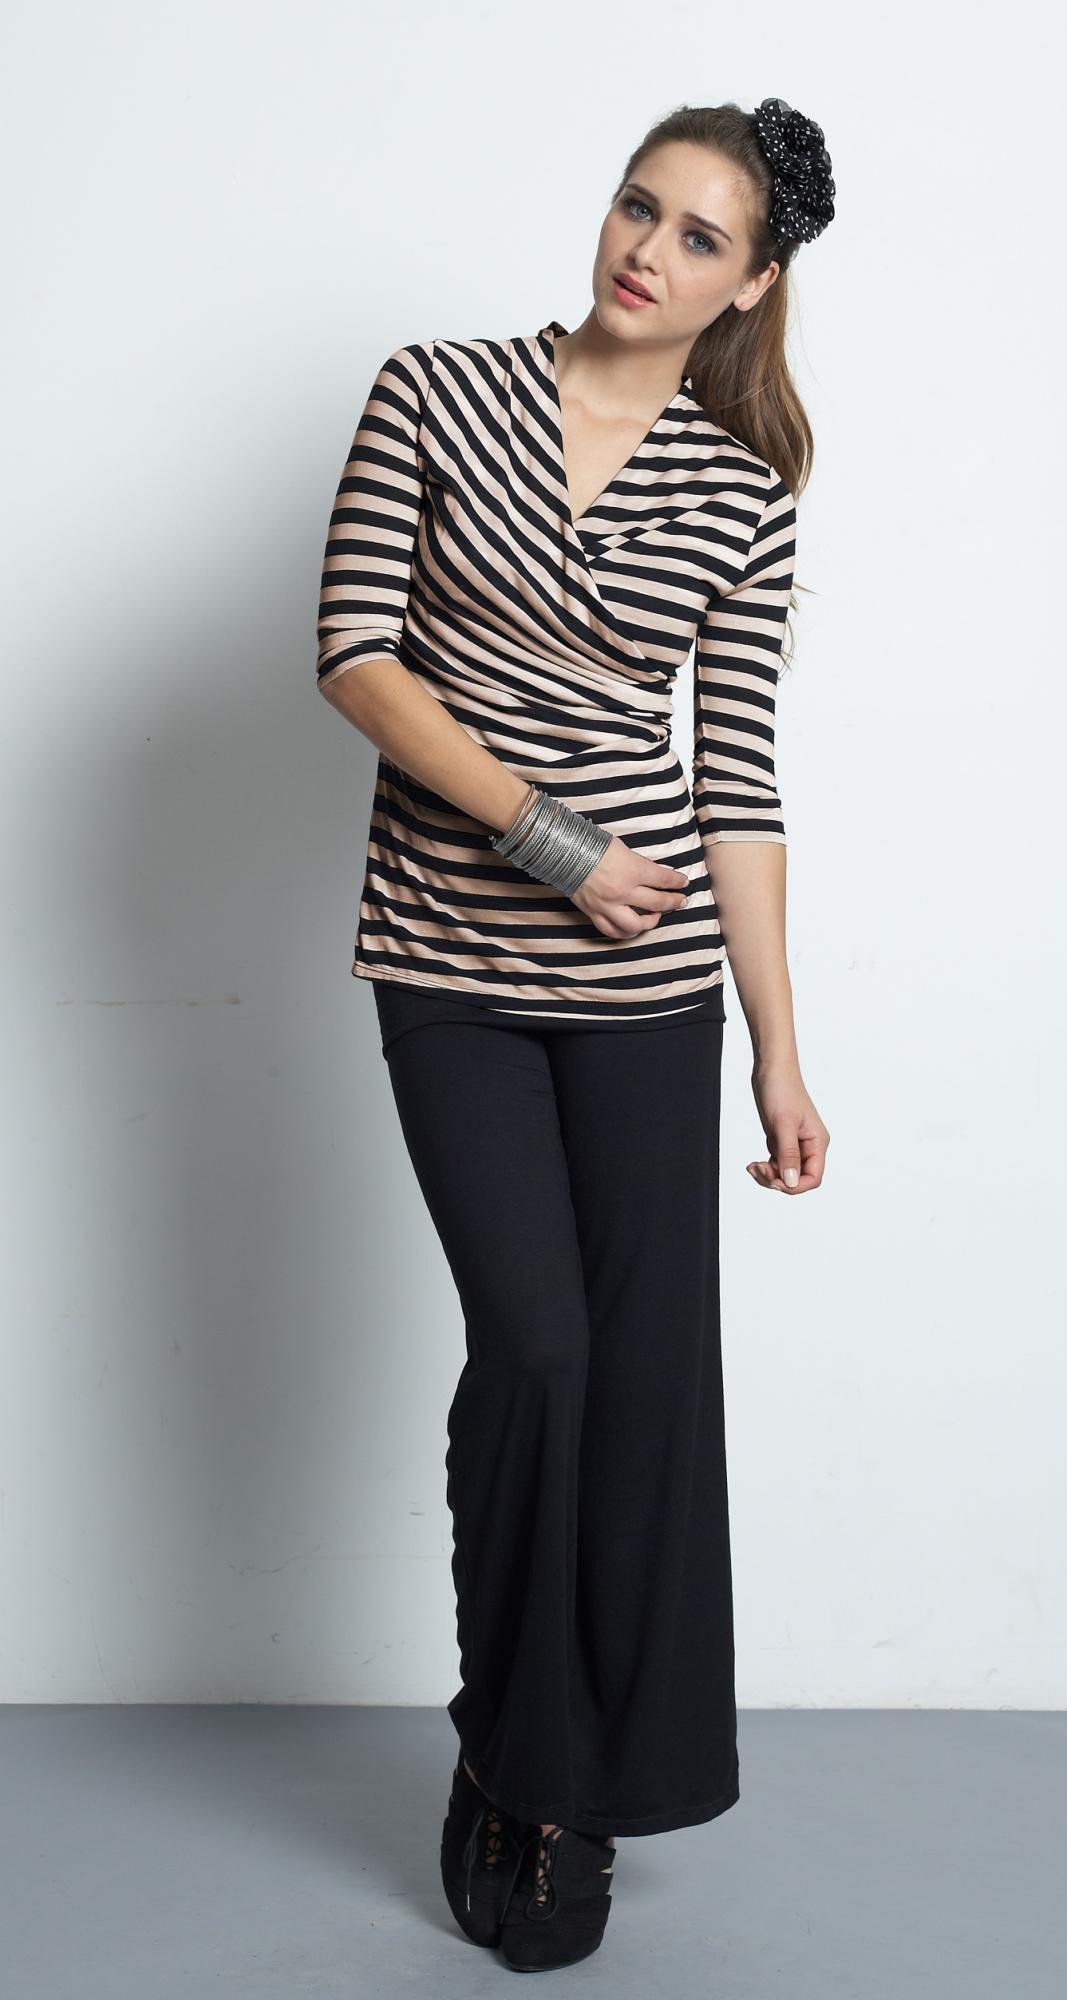 mother-en-vogue-faux-wrap-nursing-top-stripes-3.jpg